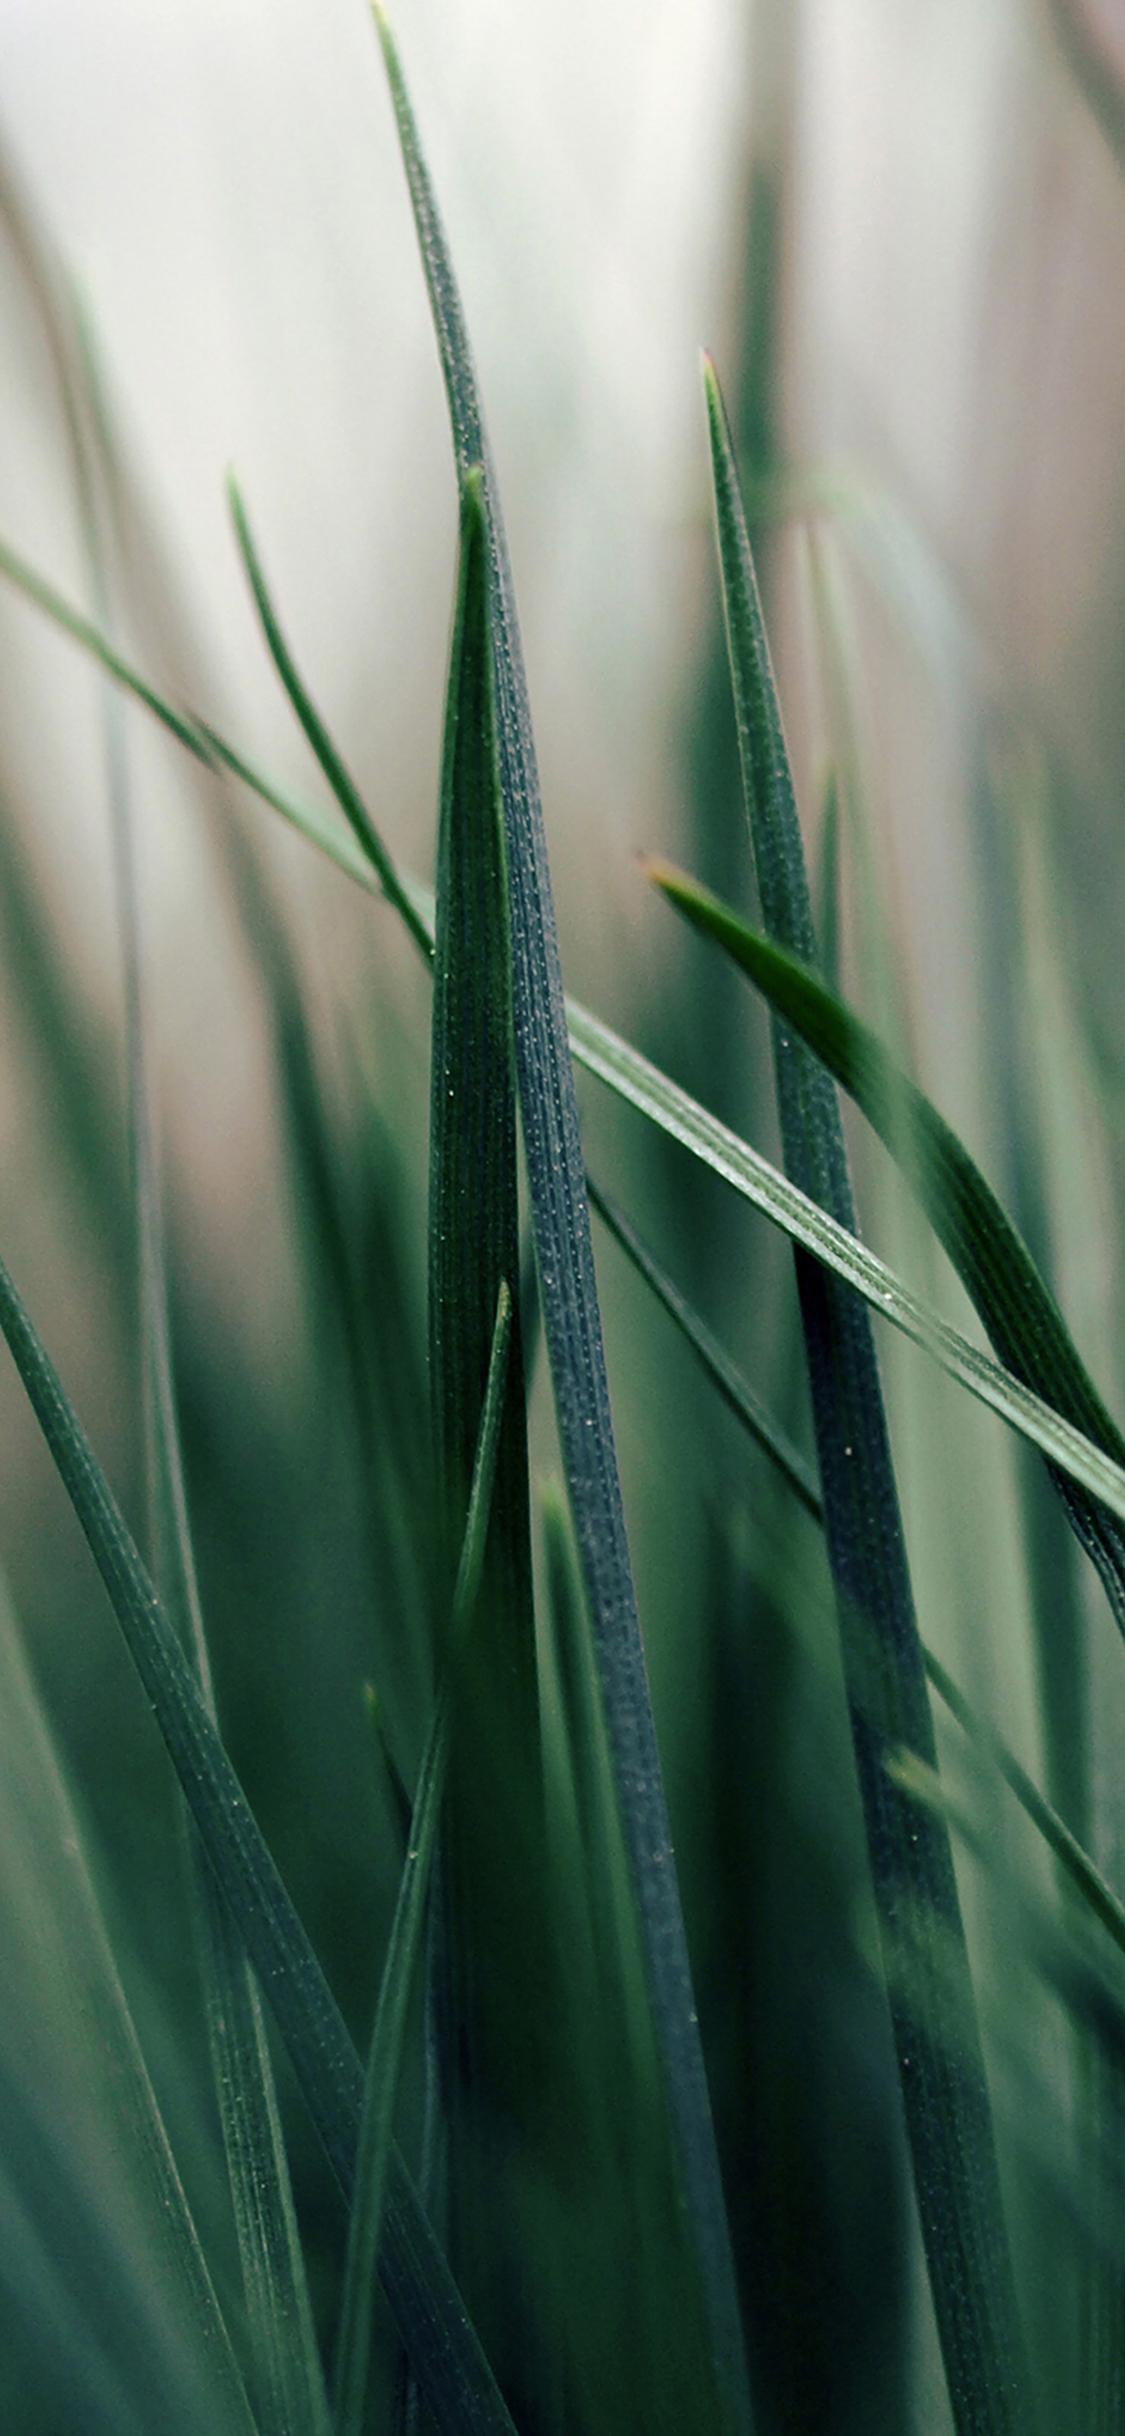 iPhoneXpapers.com-Apple-iPhone-wallpaper-mf52-grass-world-garden-leaf-nature